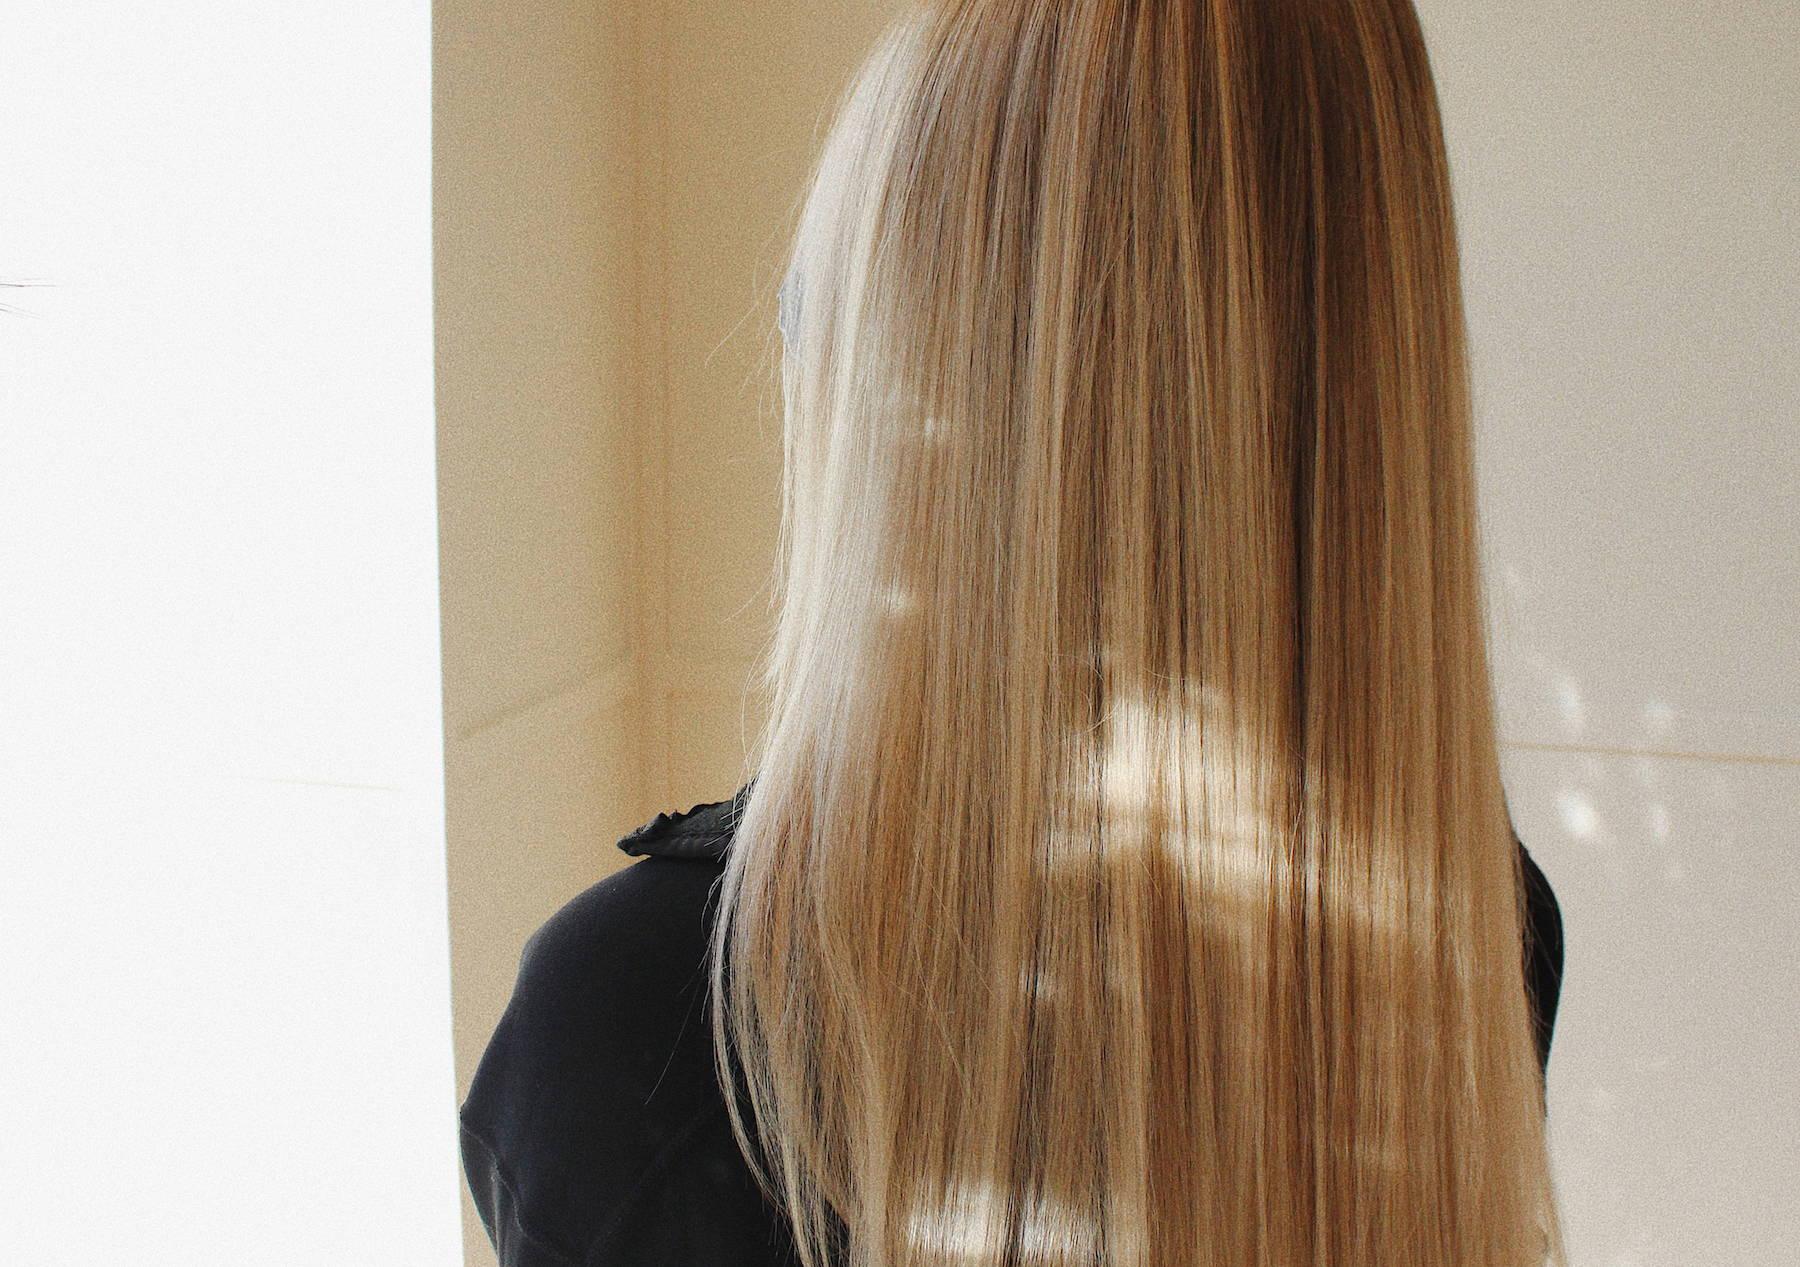 Hihoney salon blonde hair tutorial lighting